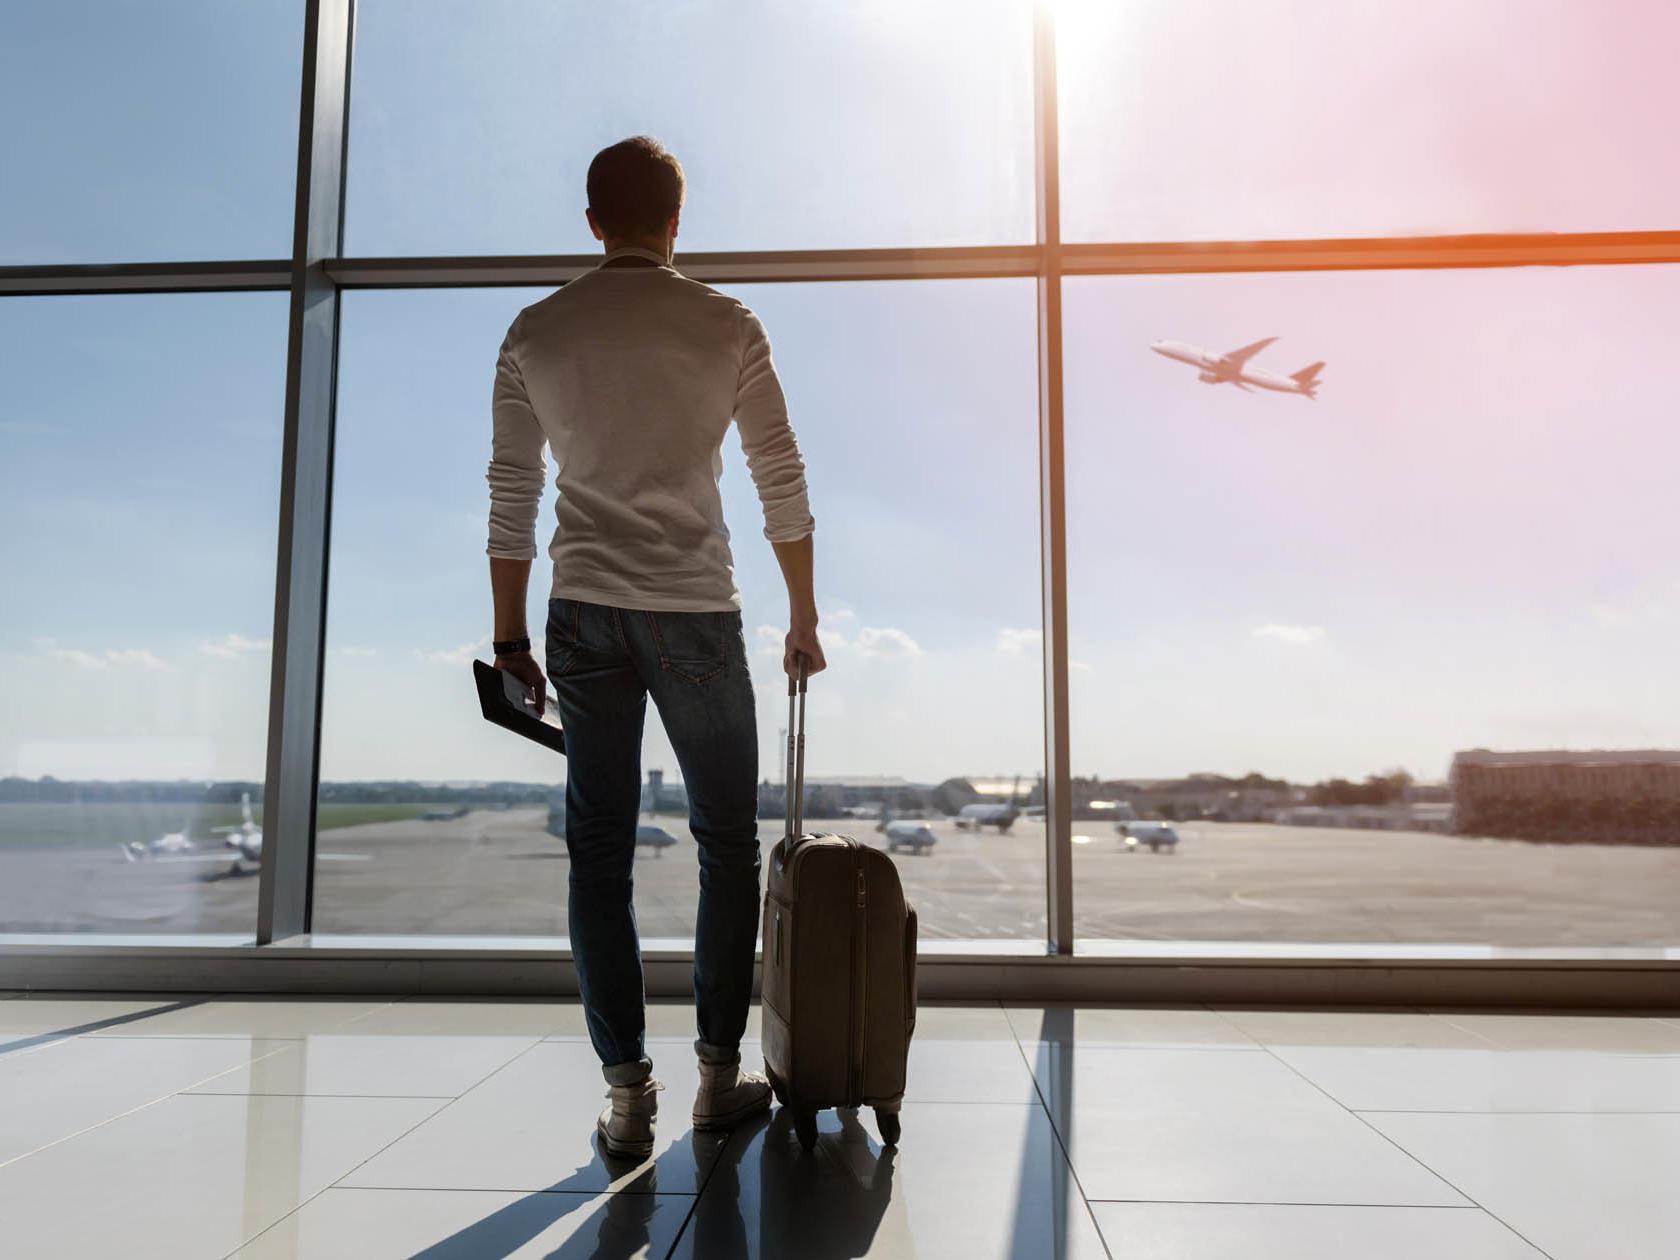 Men in the airport